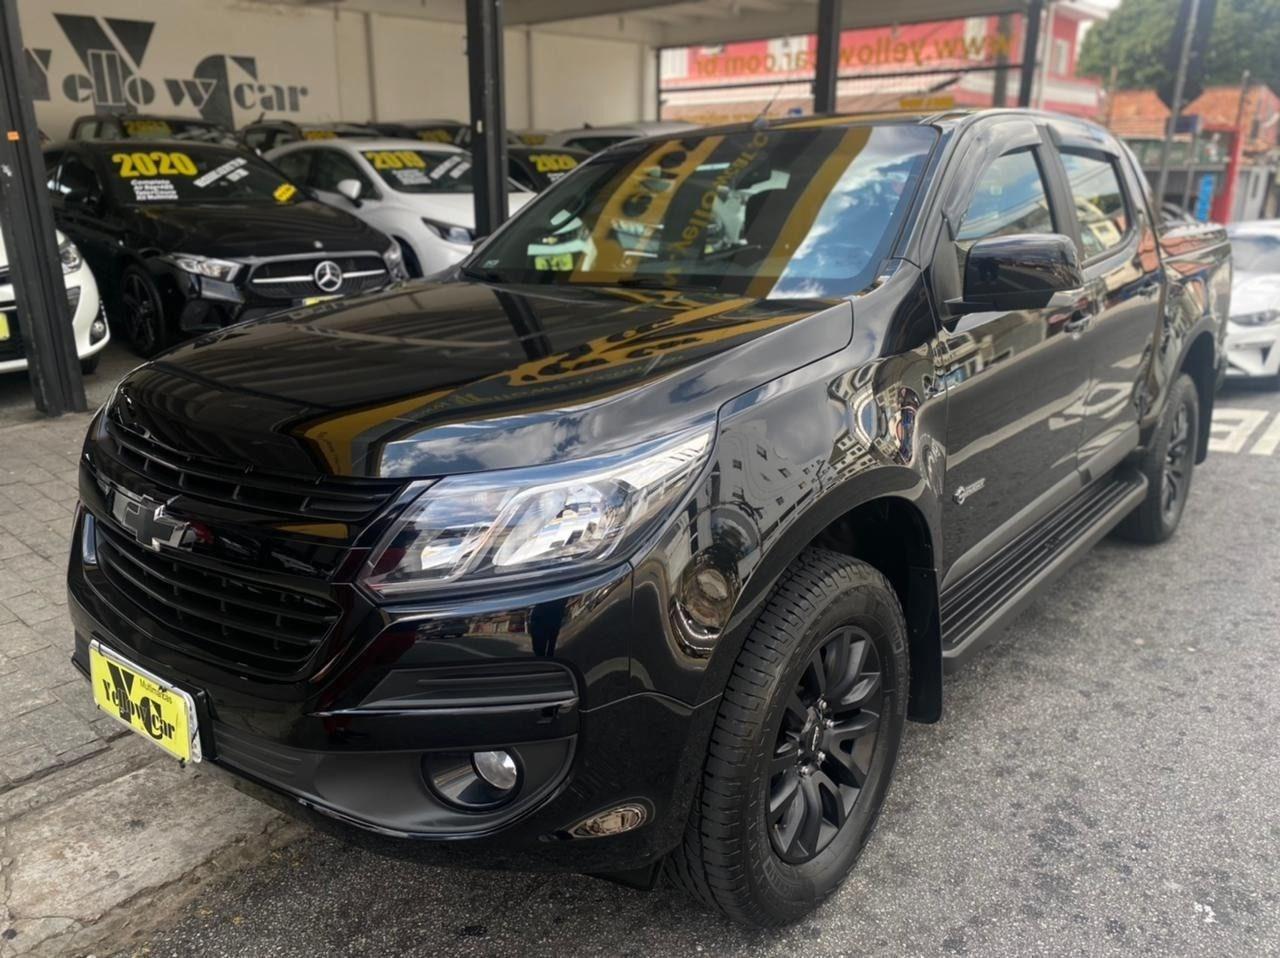 //www.autoline.com.br/carro/chevrolet/s-10-28-midnight-cd-16v-diesel-4p-4x4-turbo-automa/2019/sao-paulo-sp/15037215